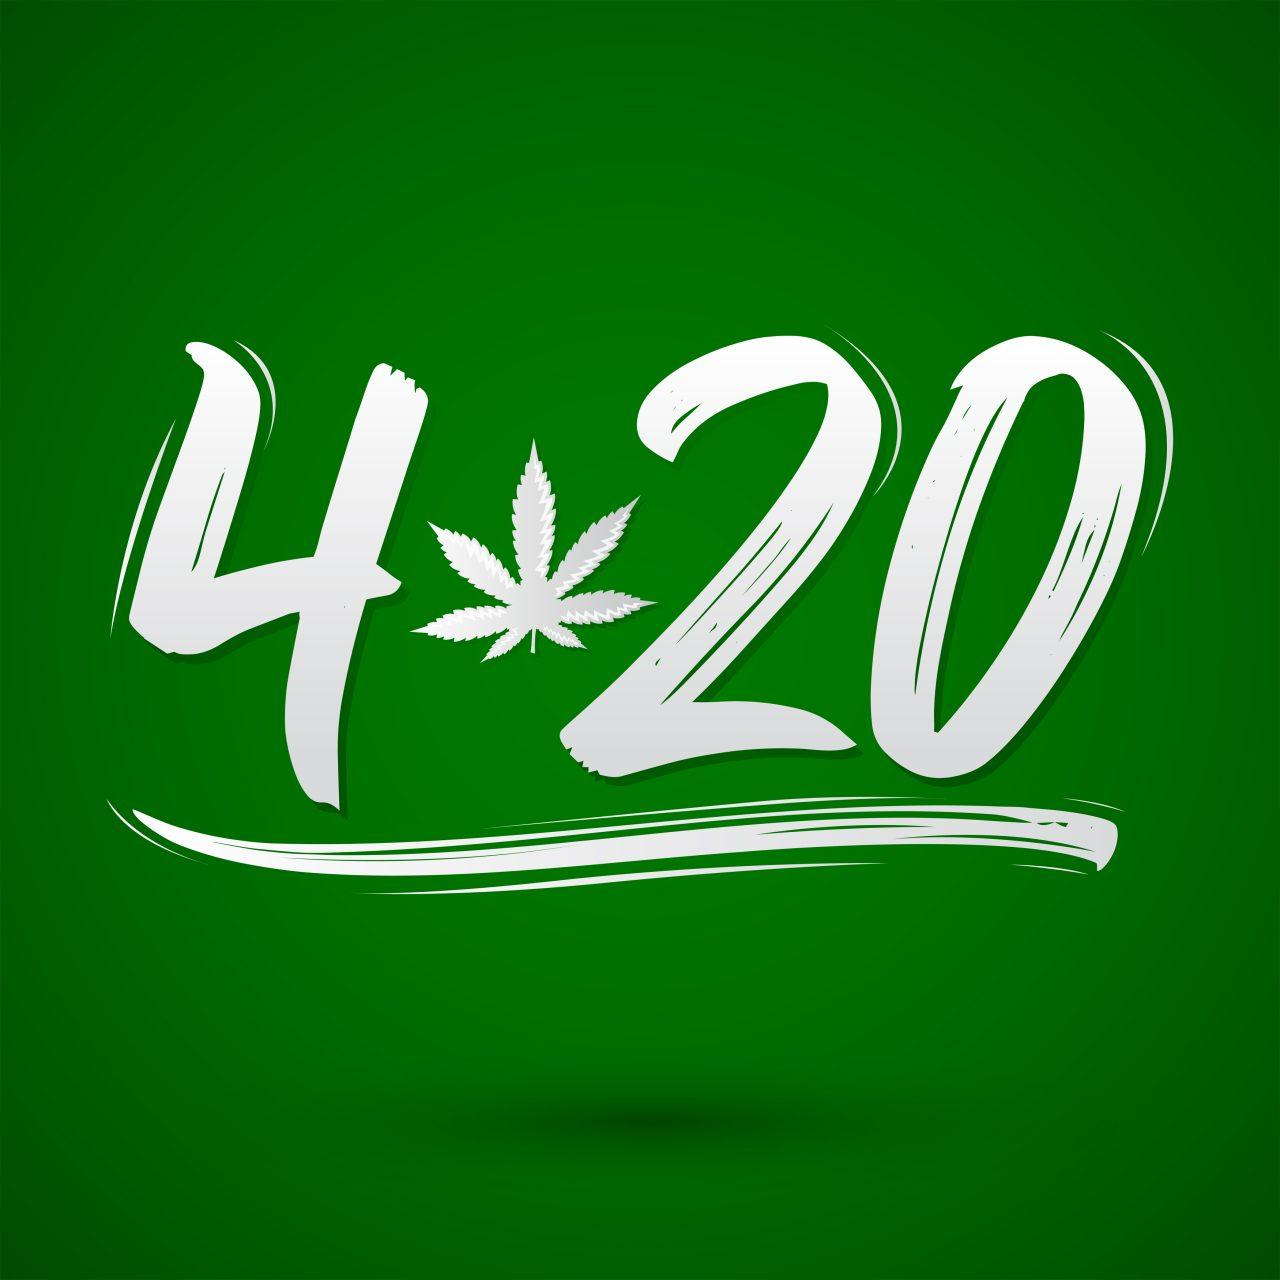 420-1280x1280.jpg